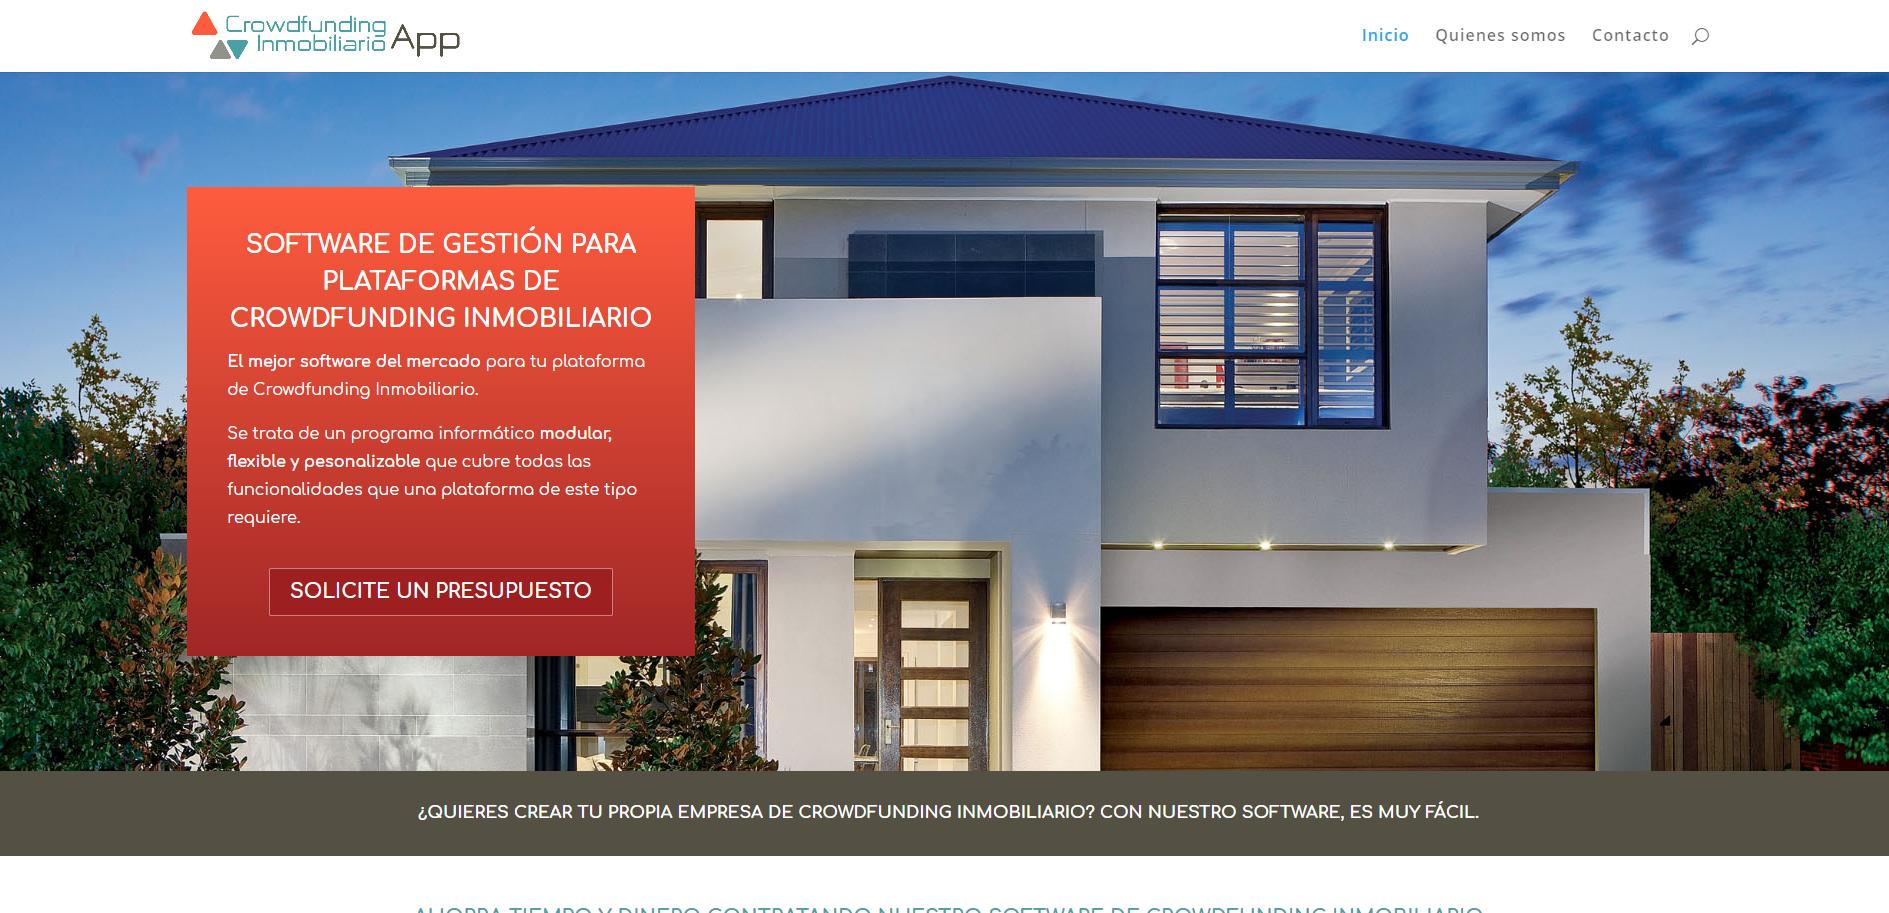 Diseño Web Crowdfunding Inmobiliario App